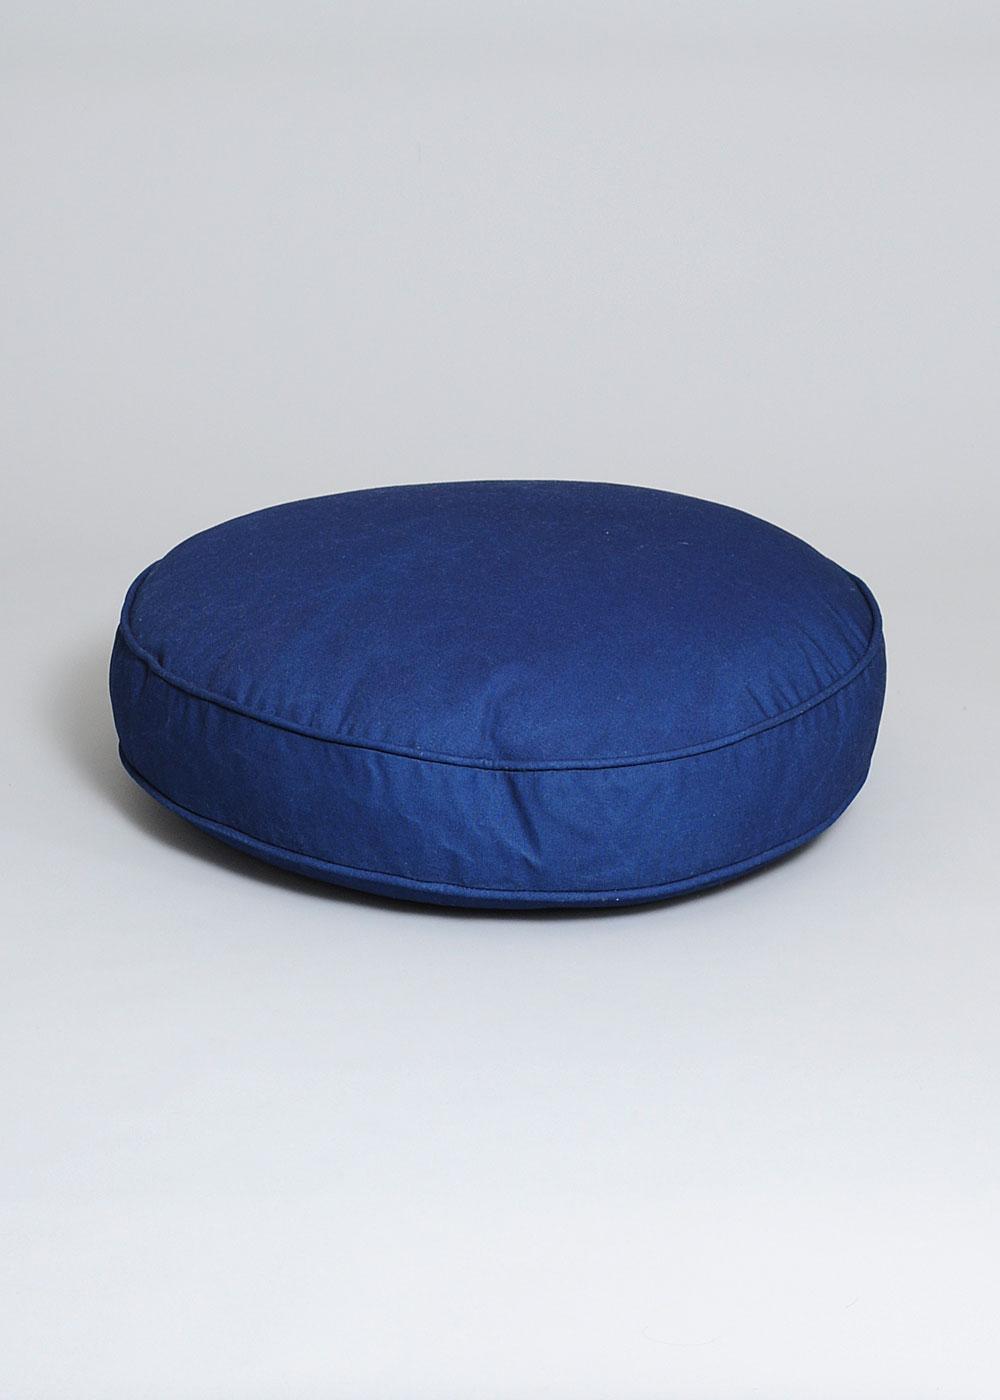 Conifer Round Indigo Floor Pillow  Garmentory